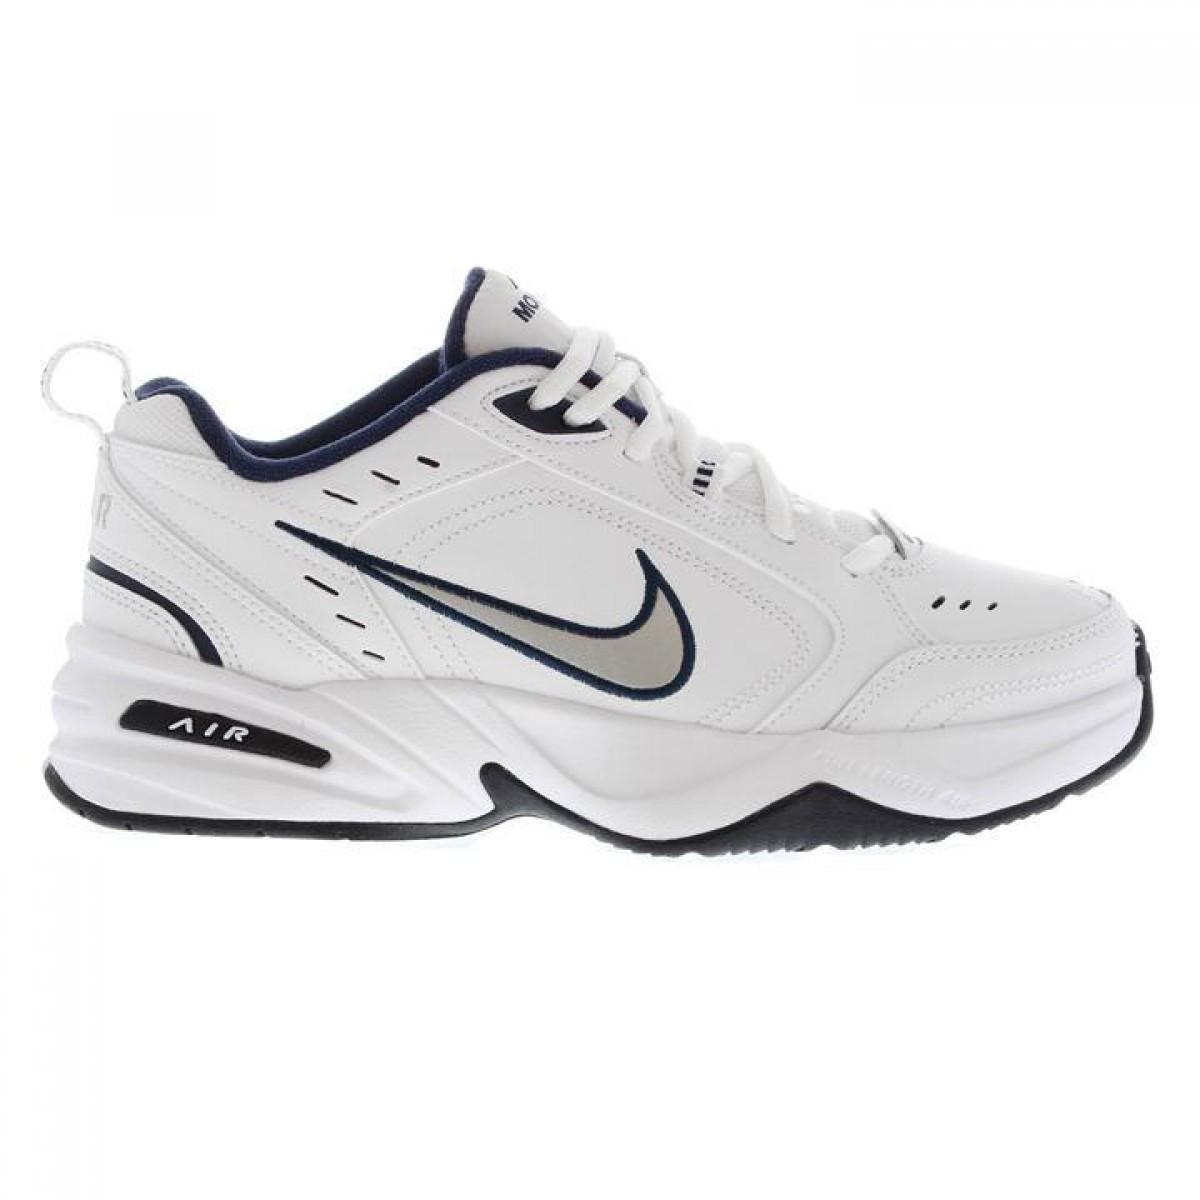 Кроссовки Nike Air Monarch Trainers White Navy - Оригинал - FAIR -  оригинальная одежда и ad8809375d1